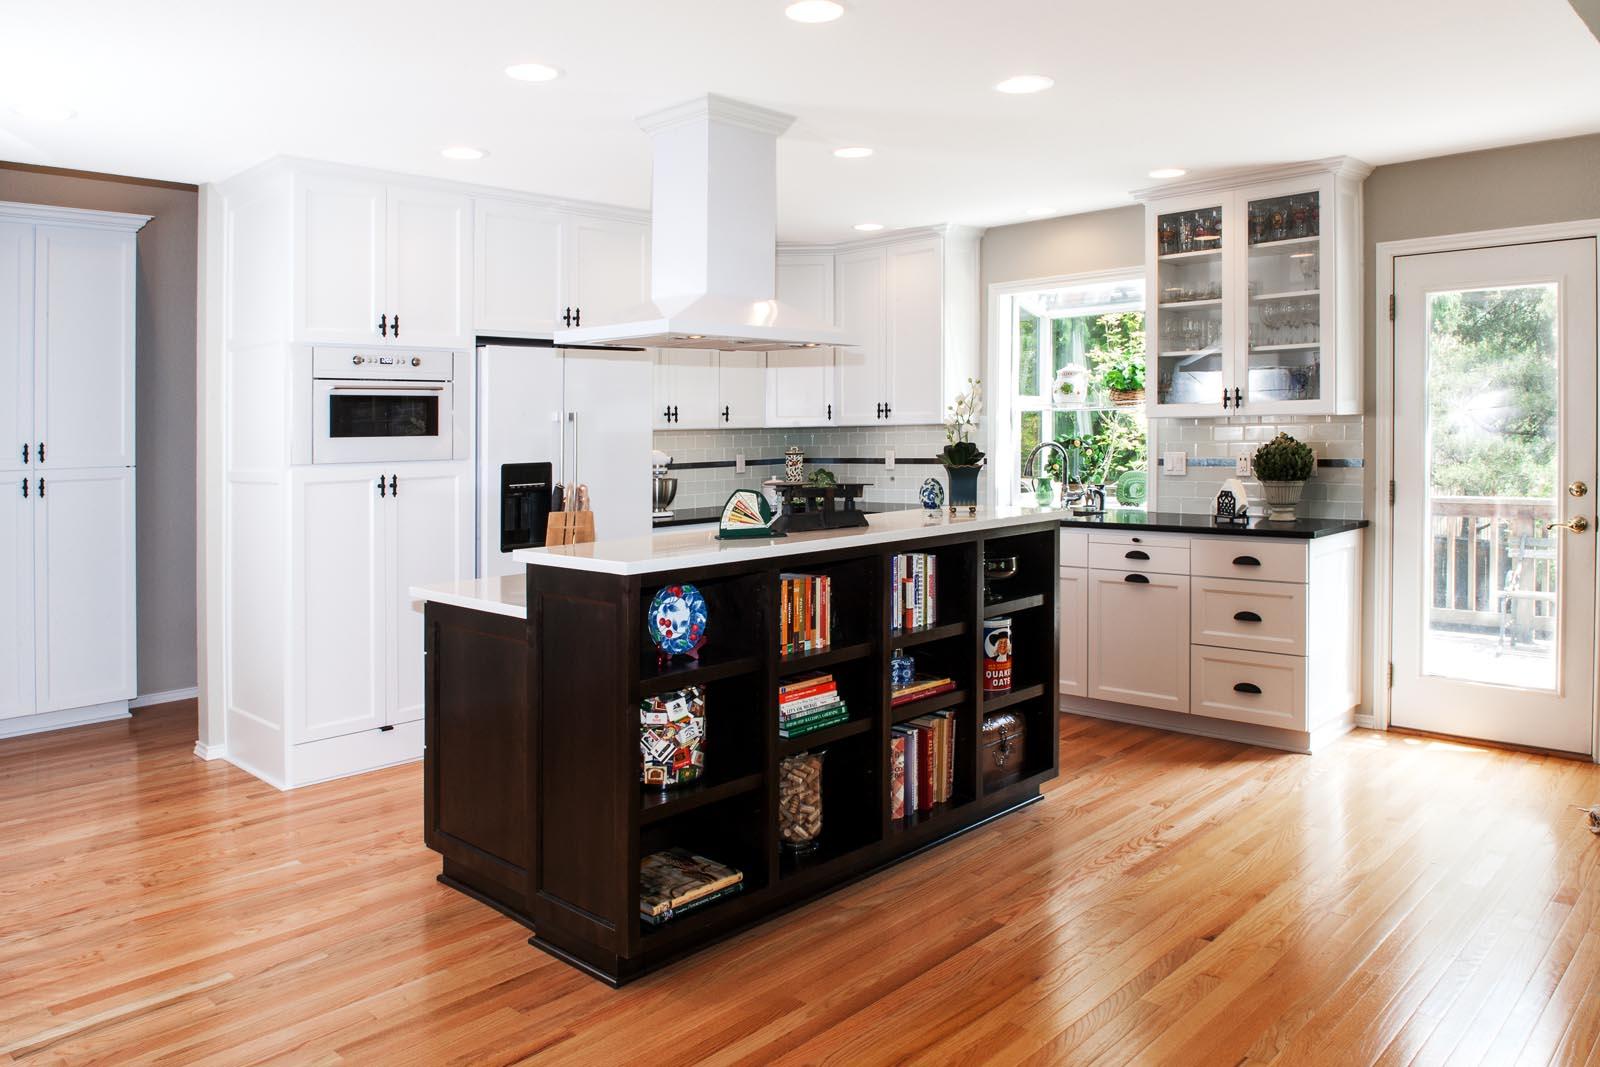 Home Remodel interior